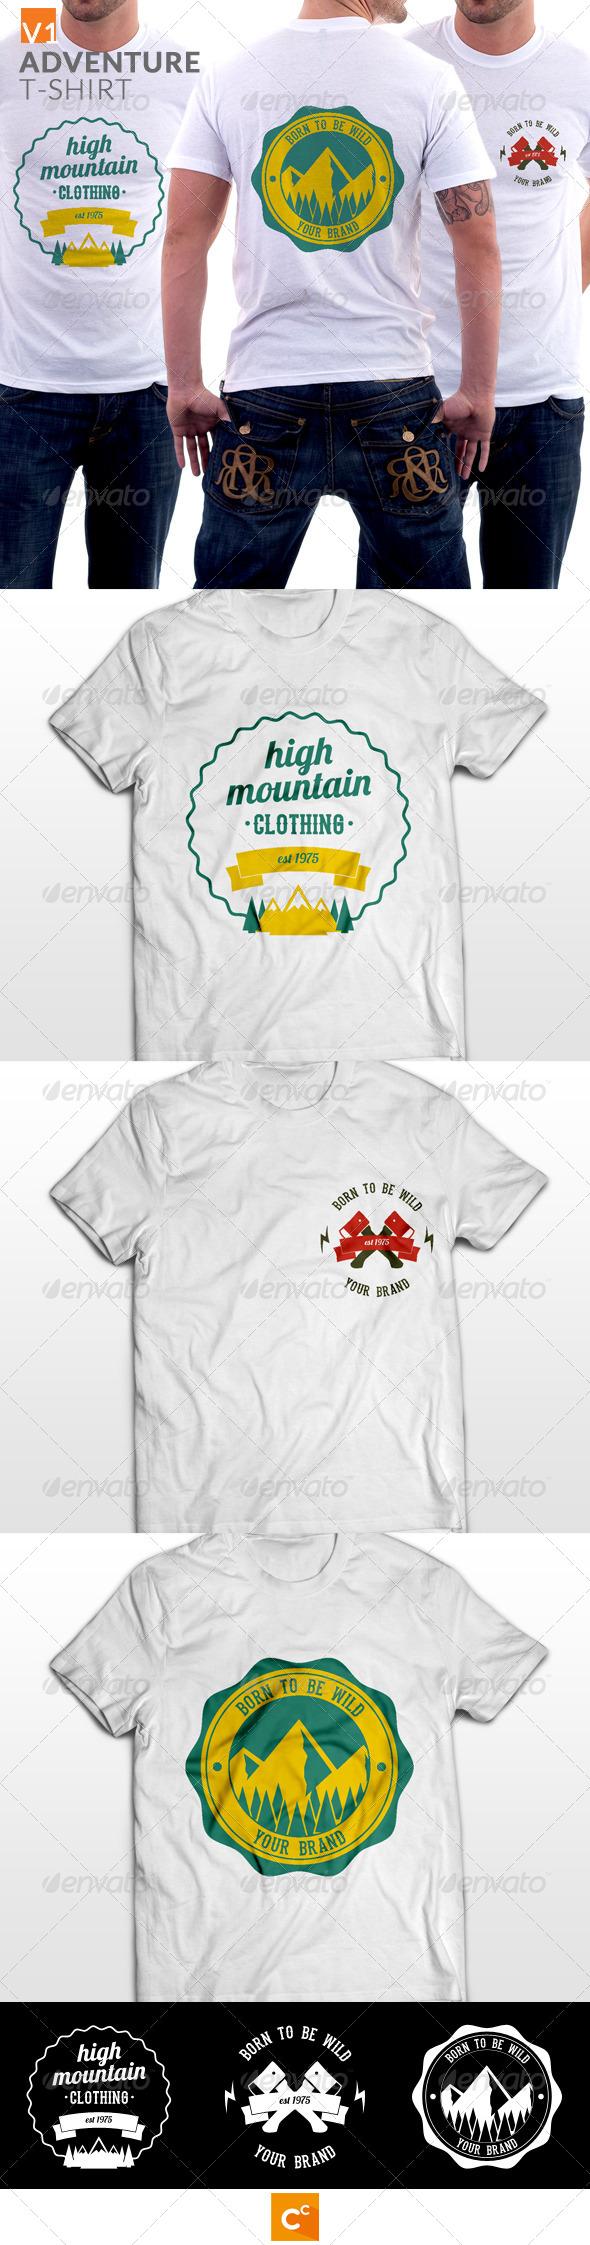 Badge Adventure T-shirt